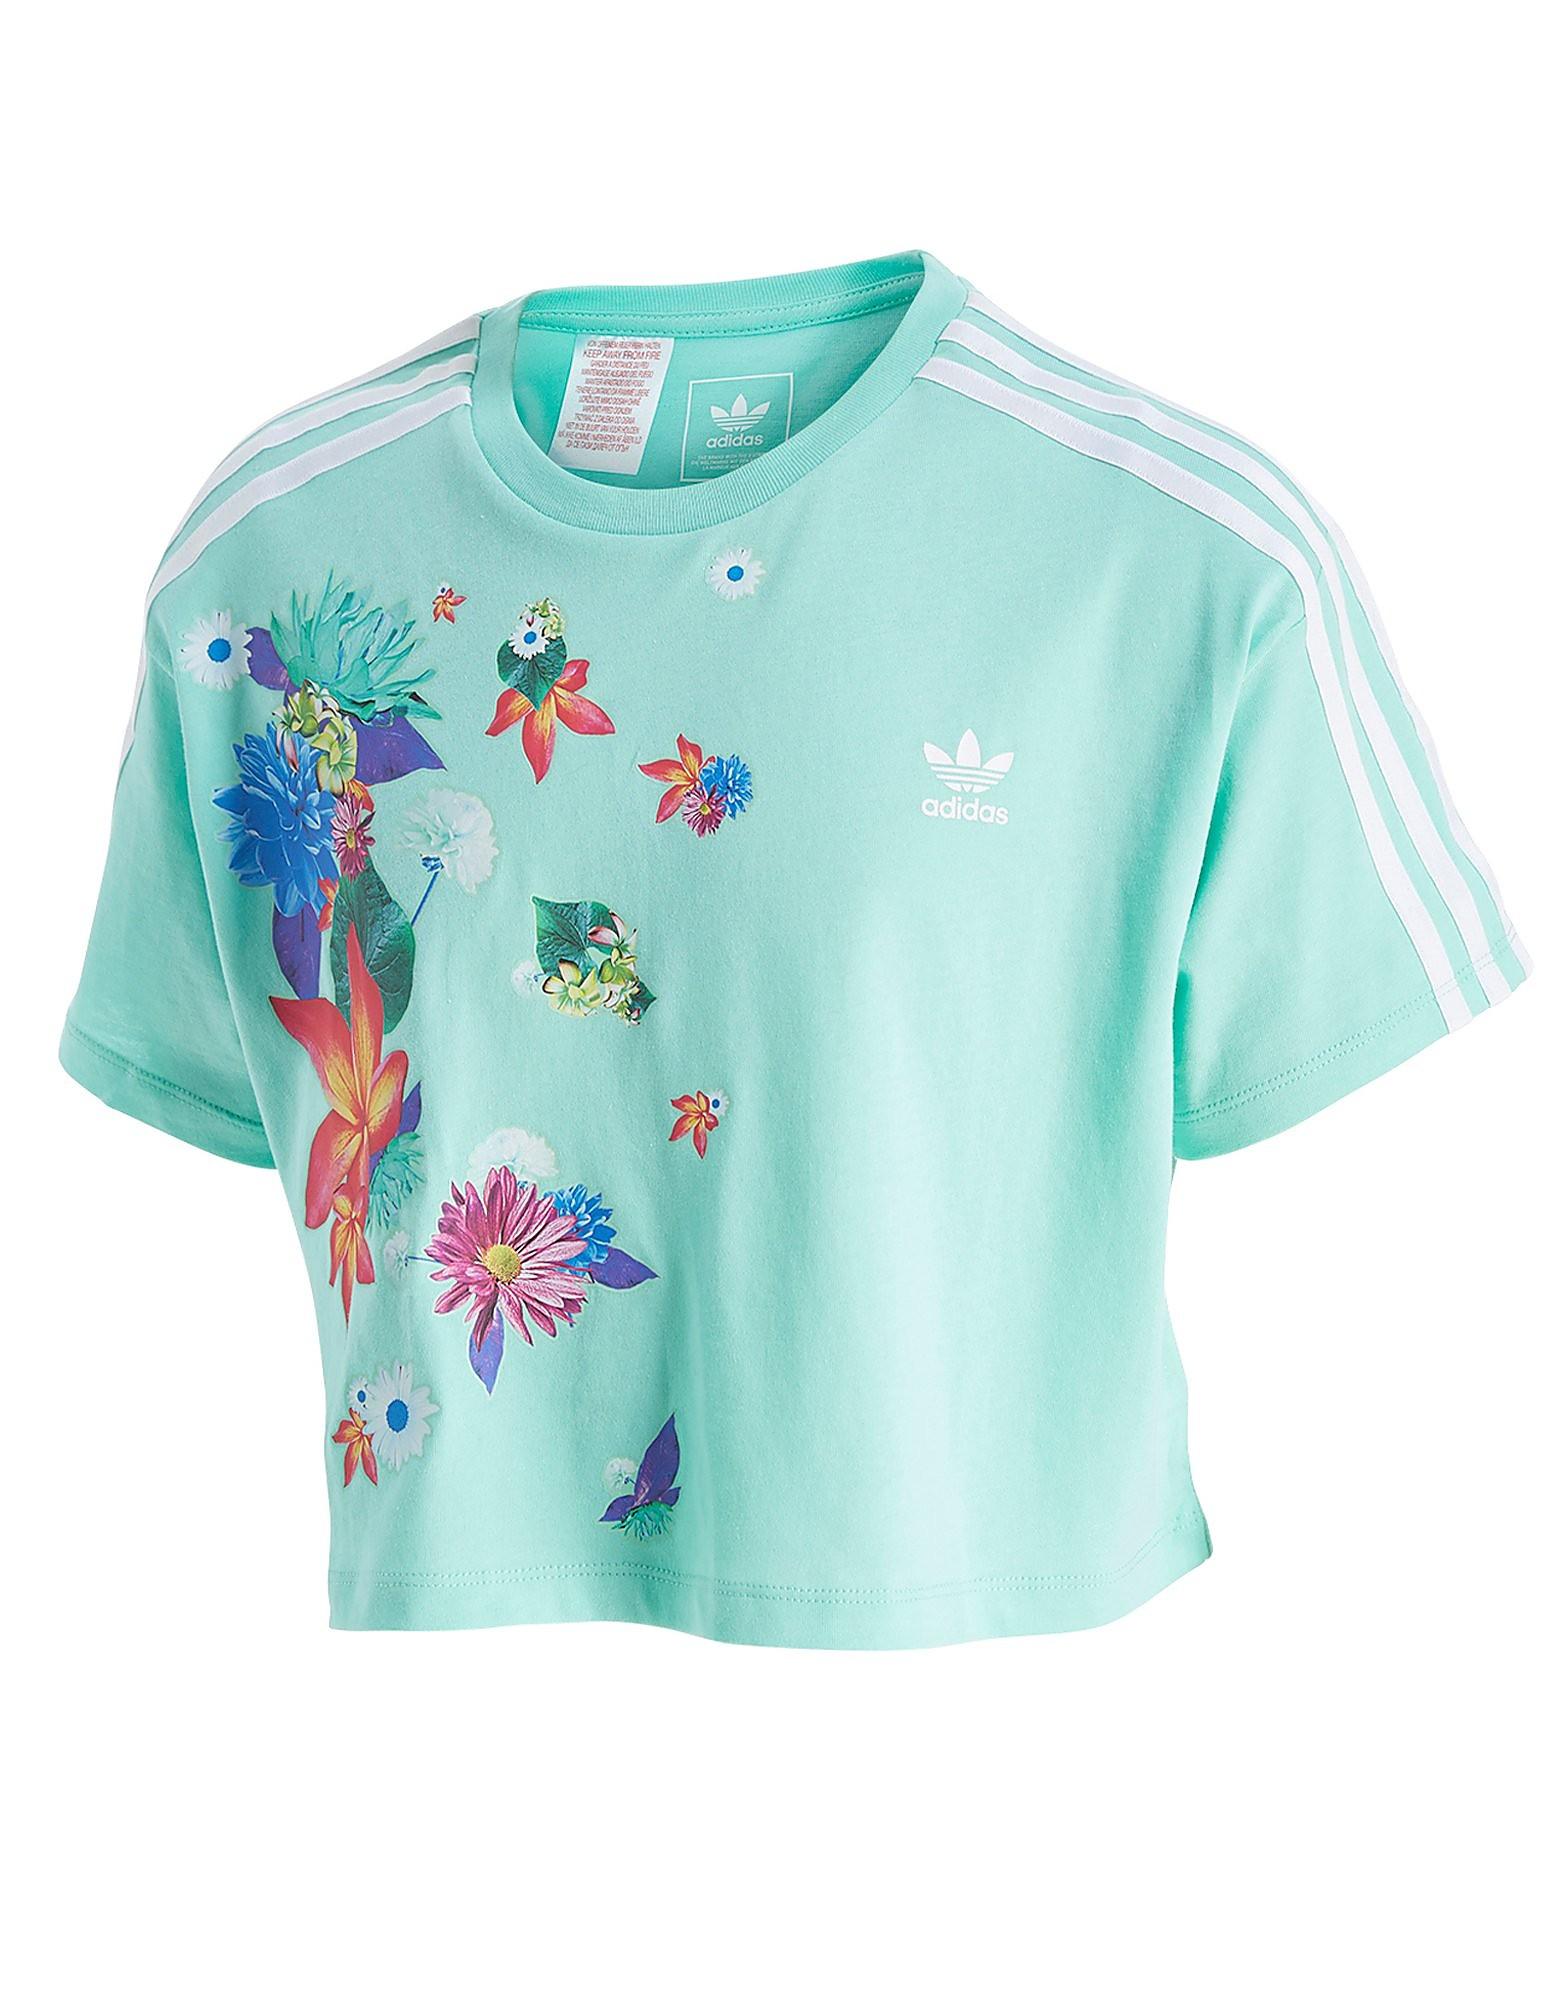 adidas Originals Girls' Floral Crop T-Shirt Junior